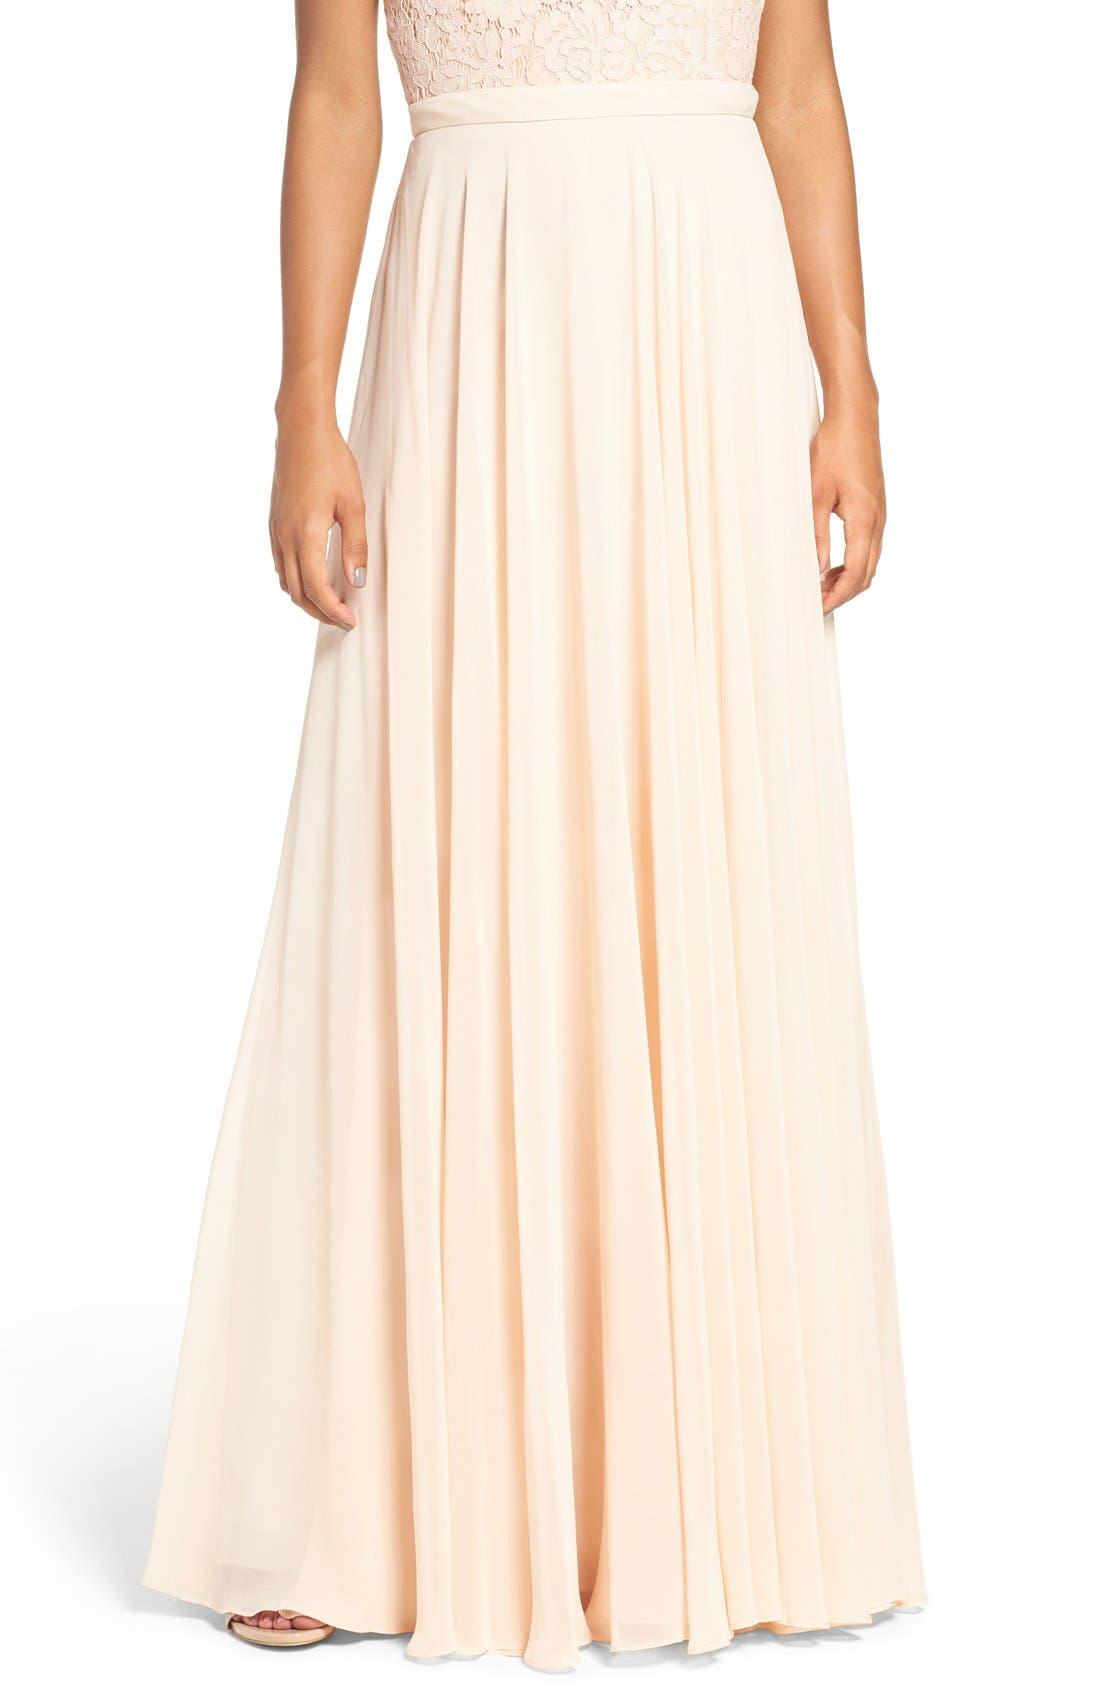 Main Image - Jenny Yoo 'Hampton' Long A-Line Chiffon Skirt